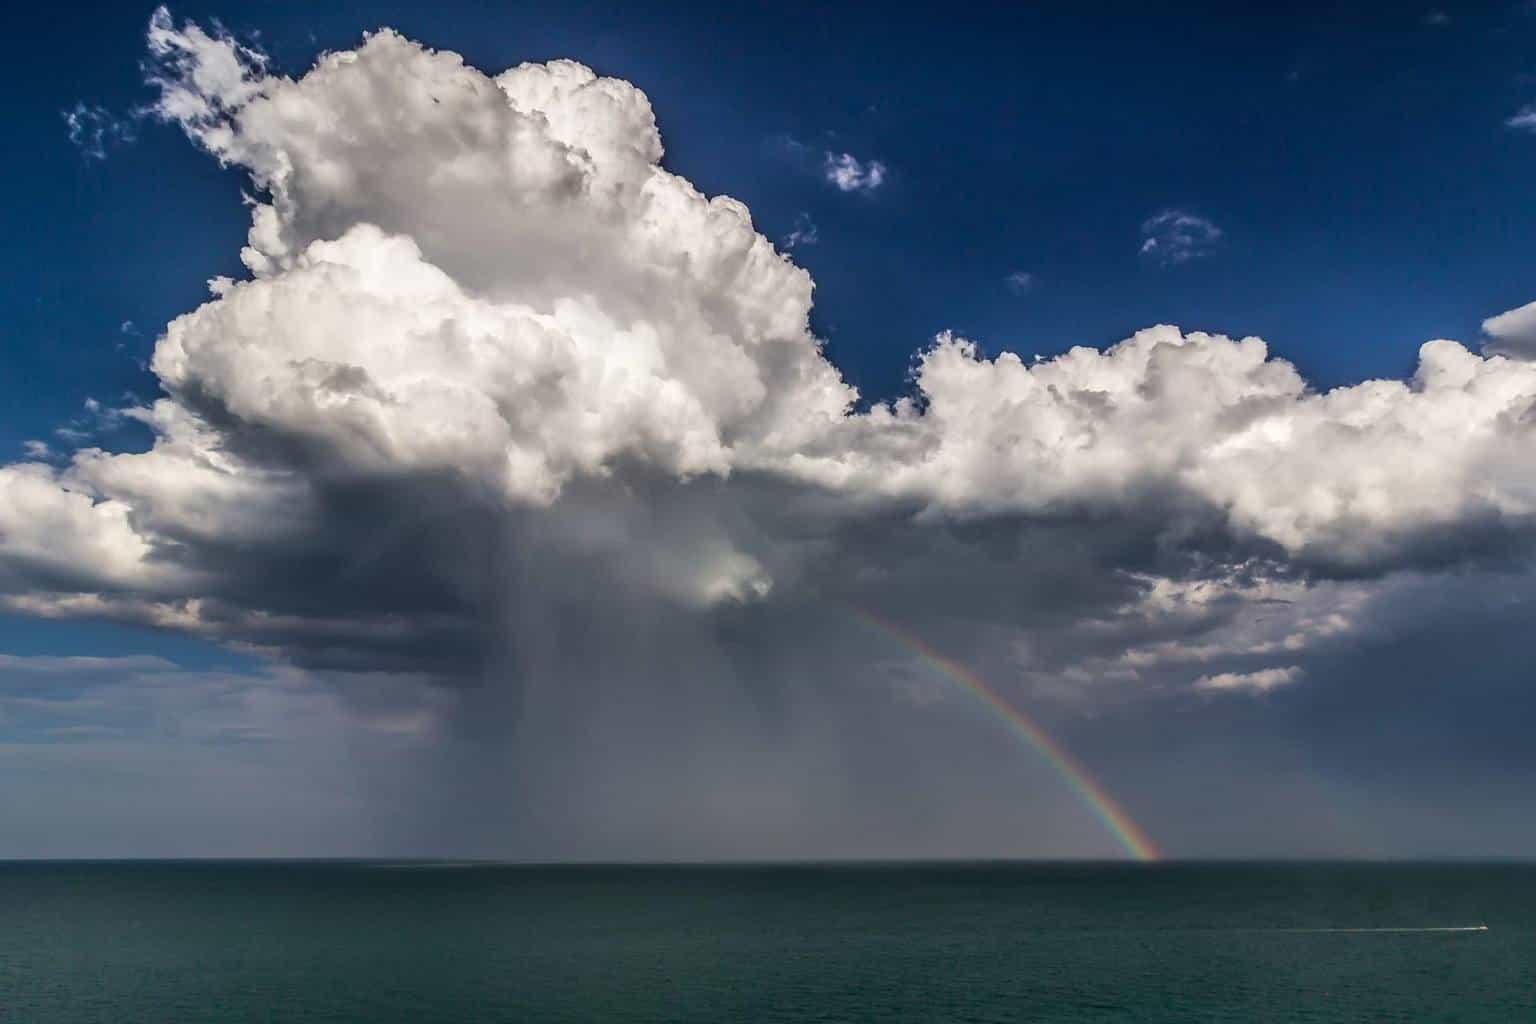 I wish it was summer again. Photo taken last summer in Italy (Adriatic Sea)